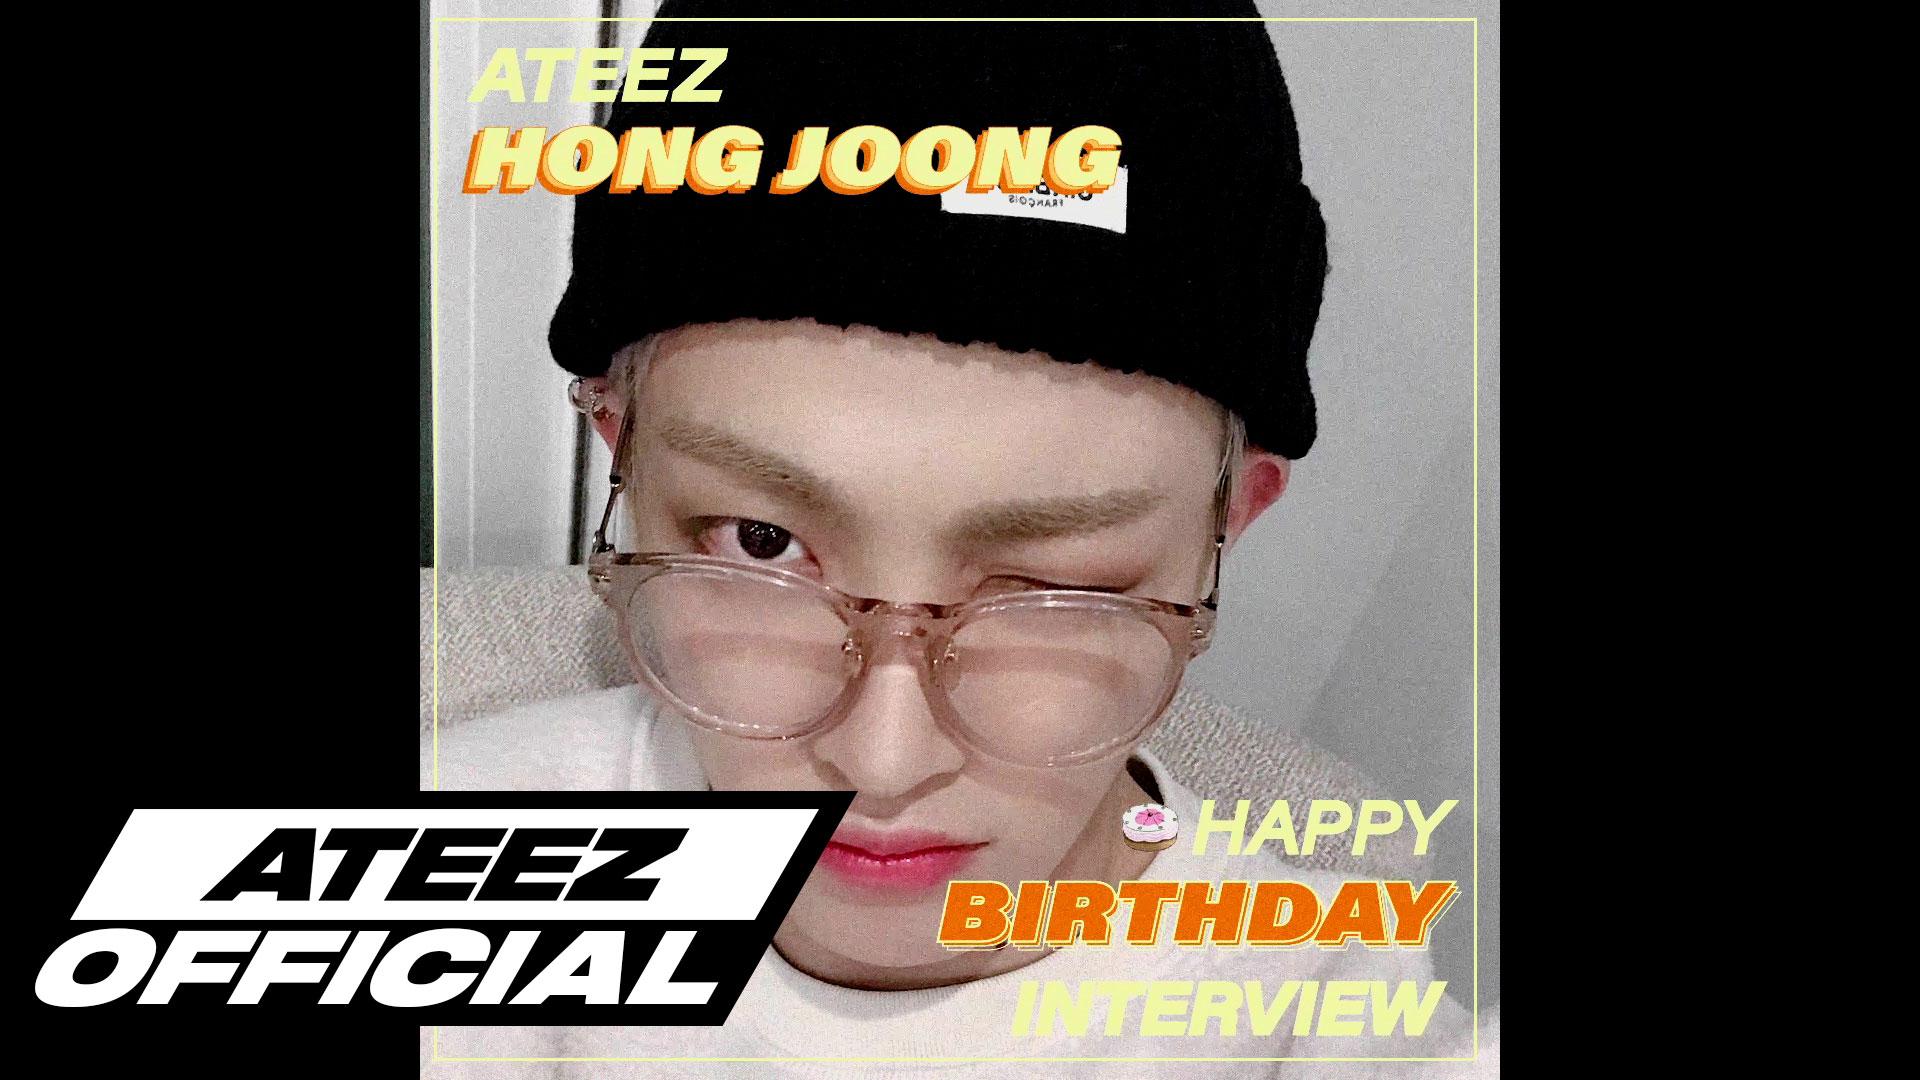 ATEEZ(에이티즈) 홍중 생일 8문 8답 INTERVIEW